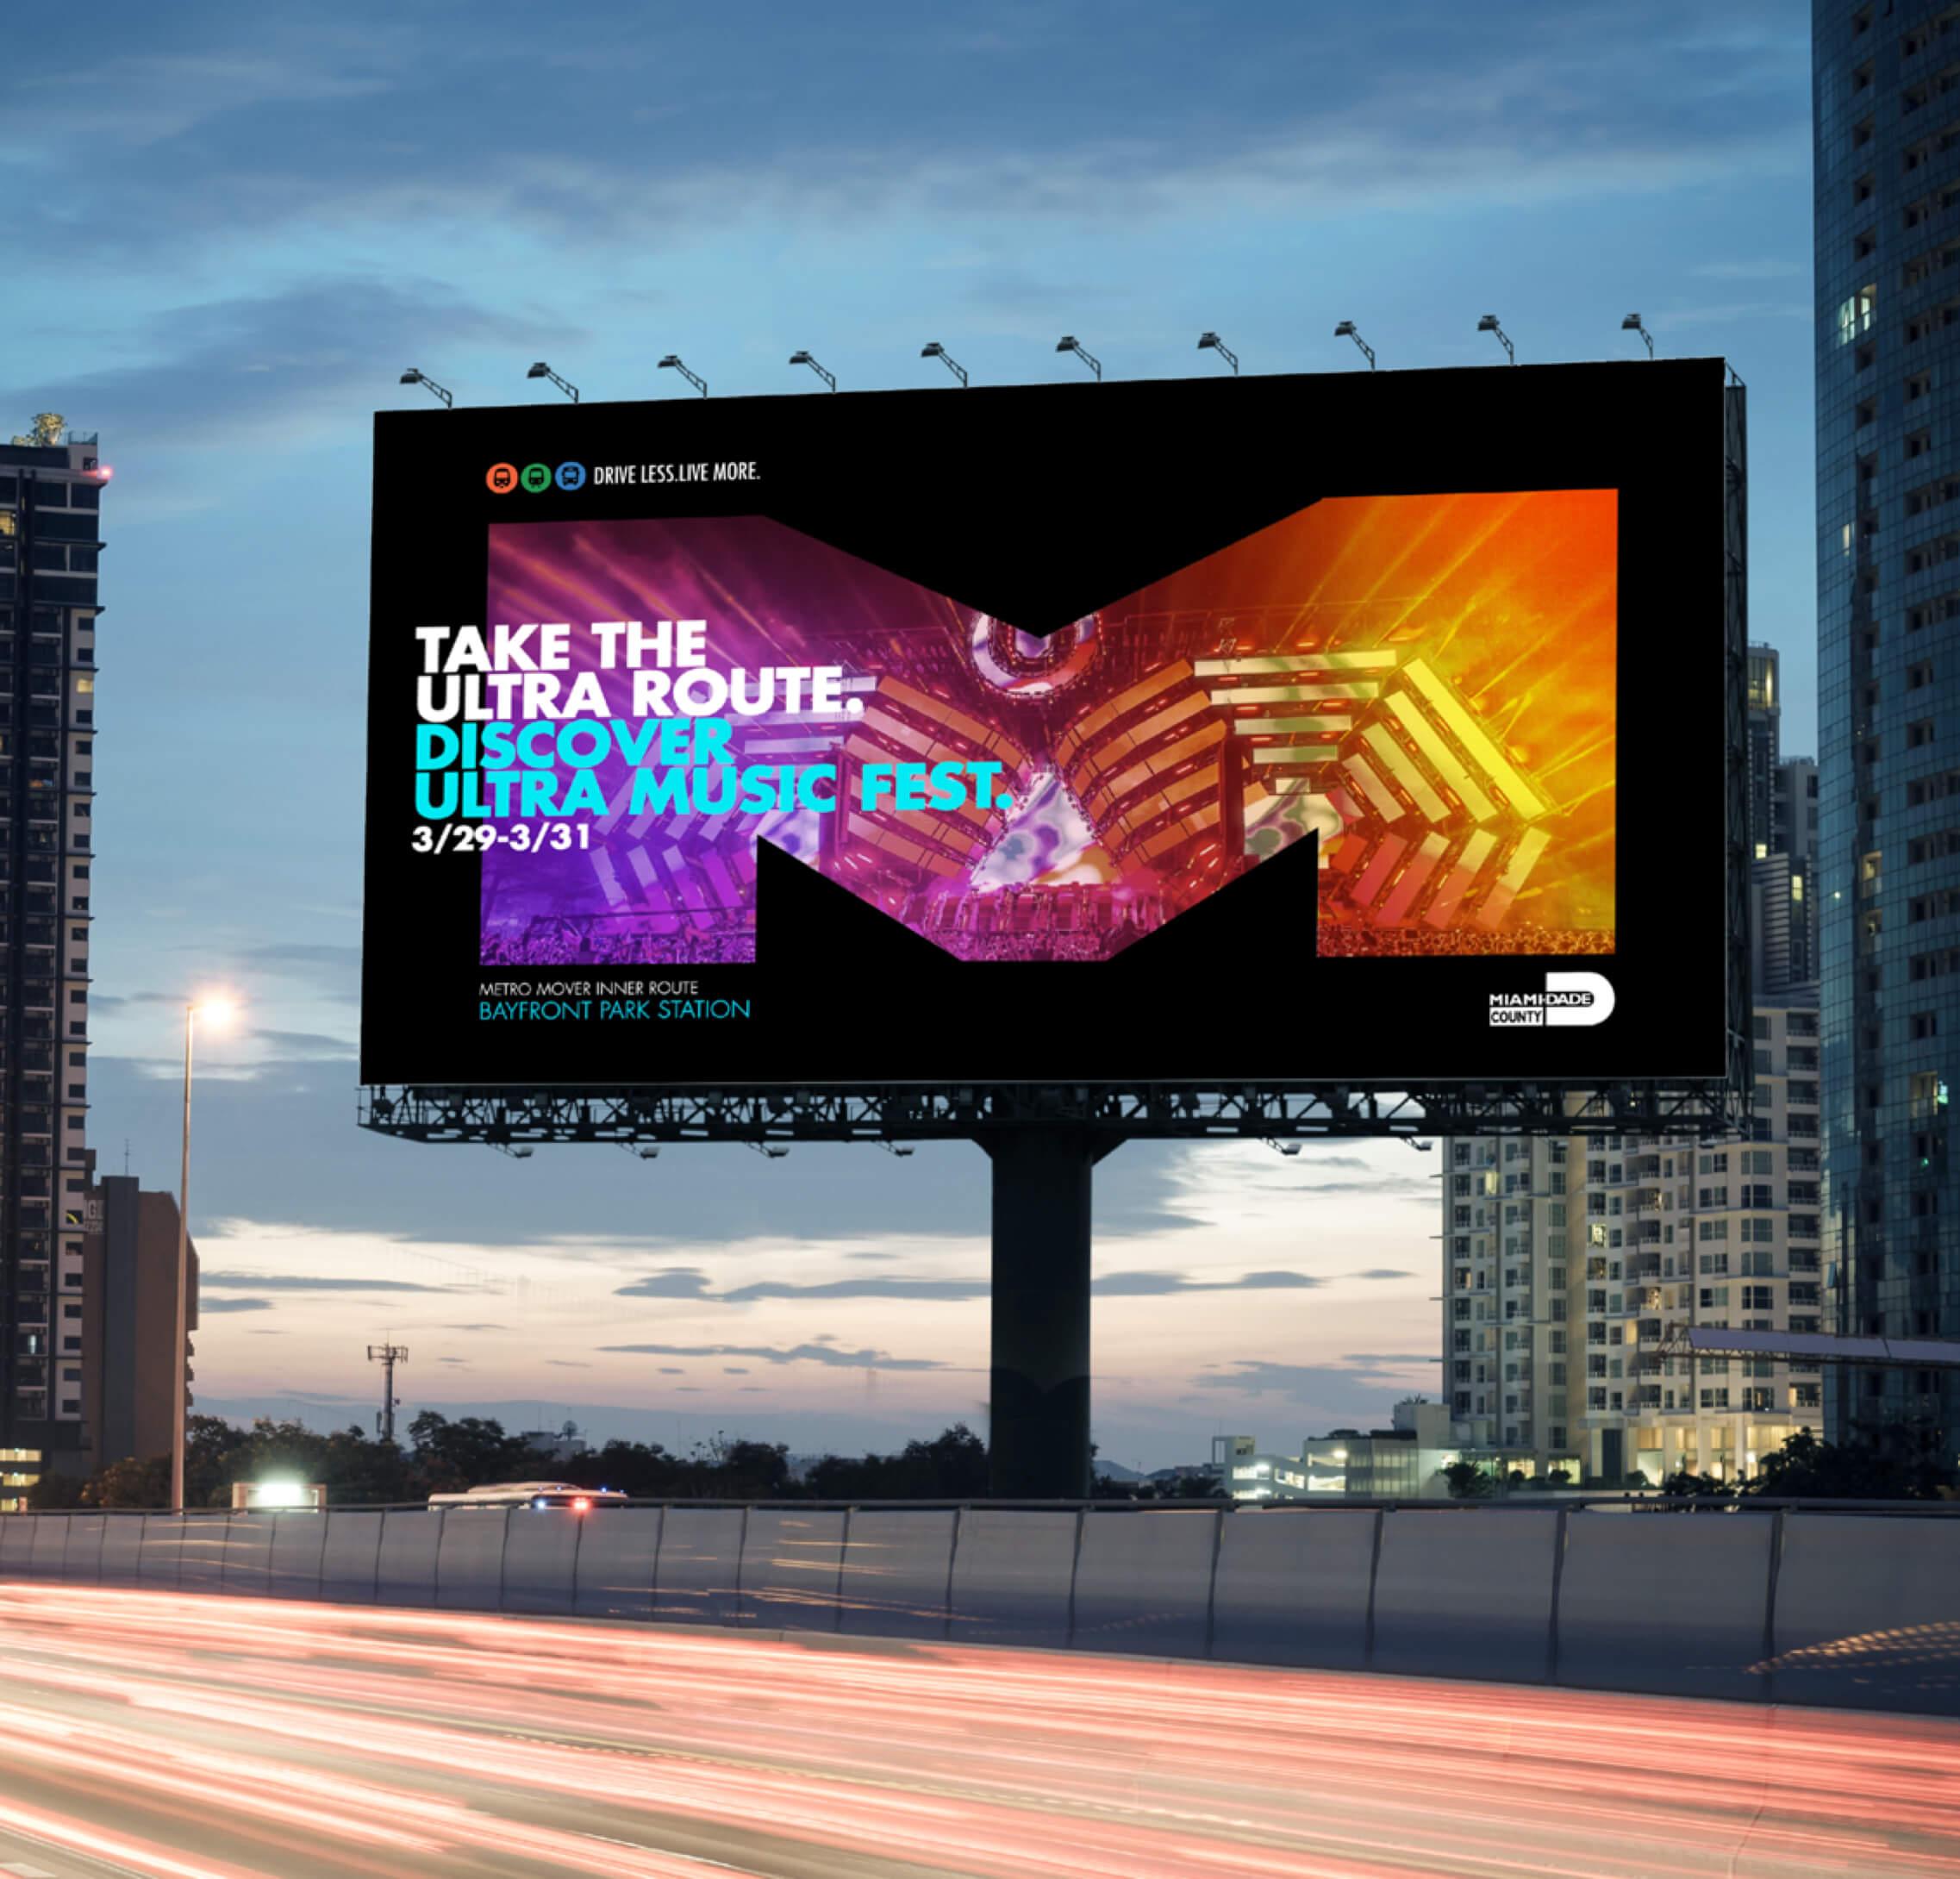 Miami Dade Transit Billboard